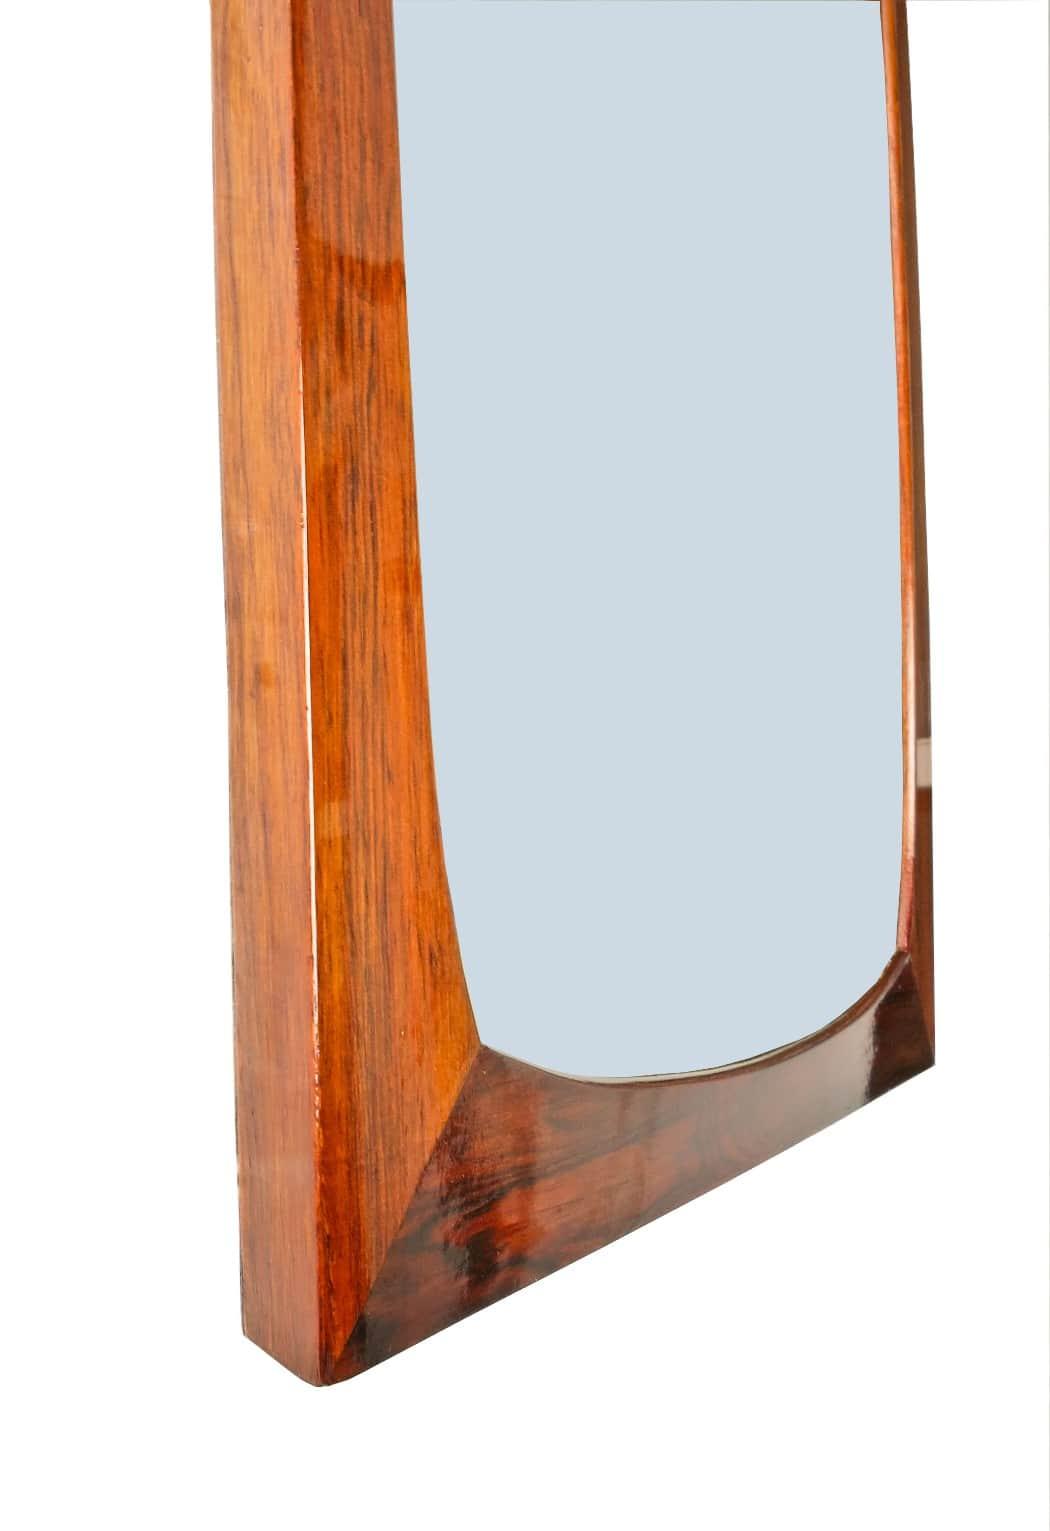 Mid century rosewood mirror Danish modern furniture scandinavian London